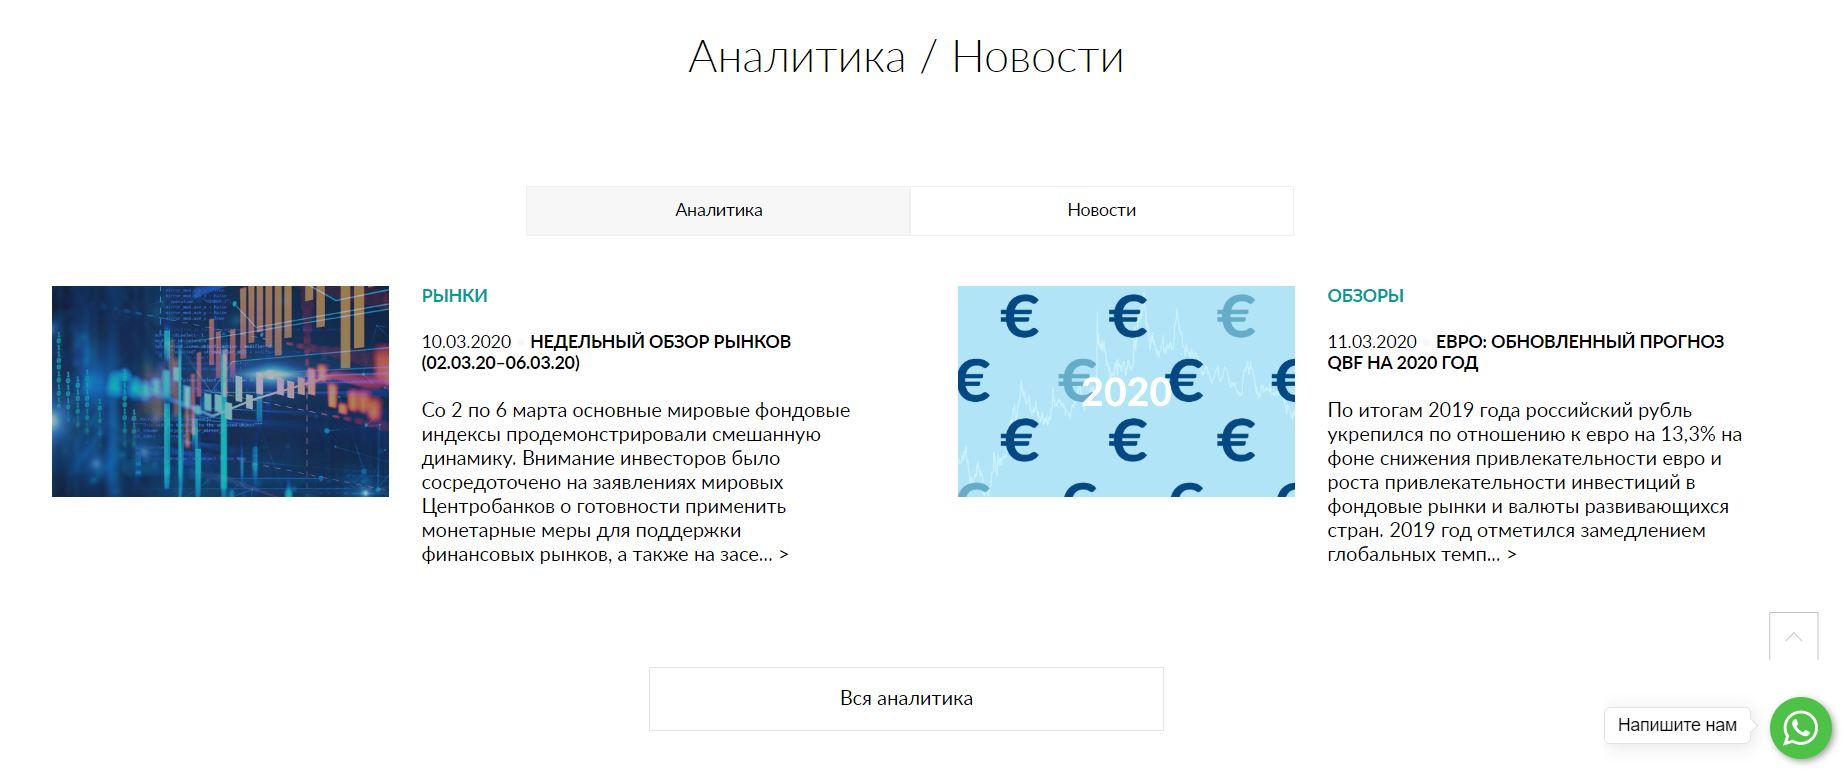 qbfin broker site